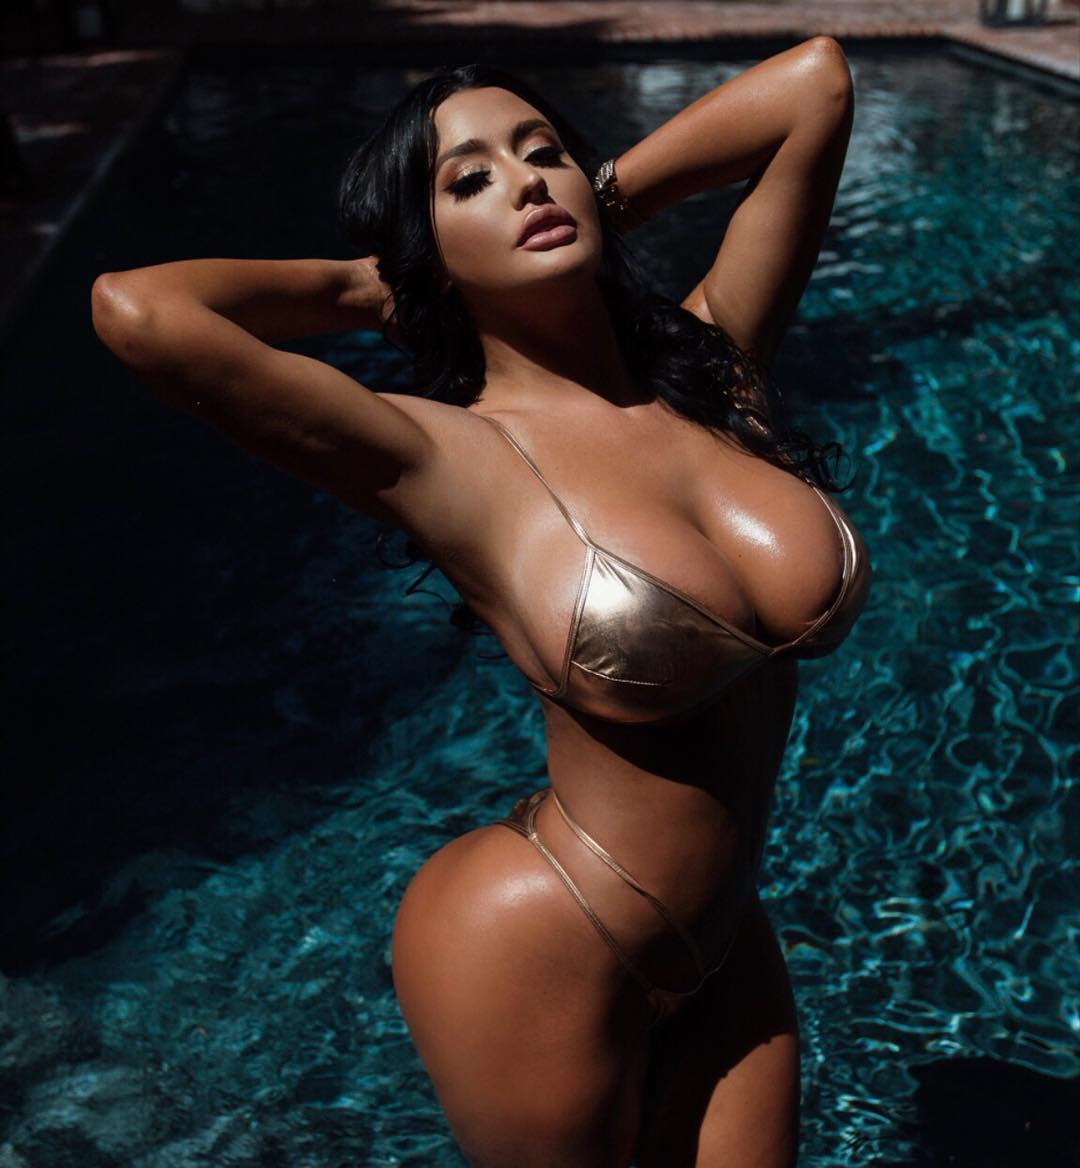 Becky Hudson big titties sexy girl